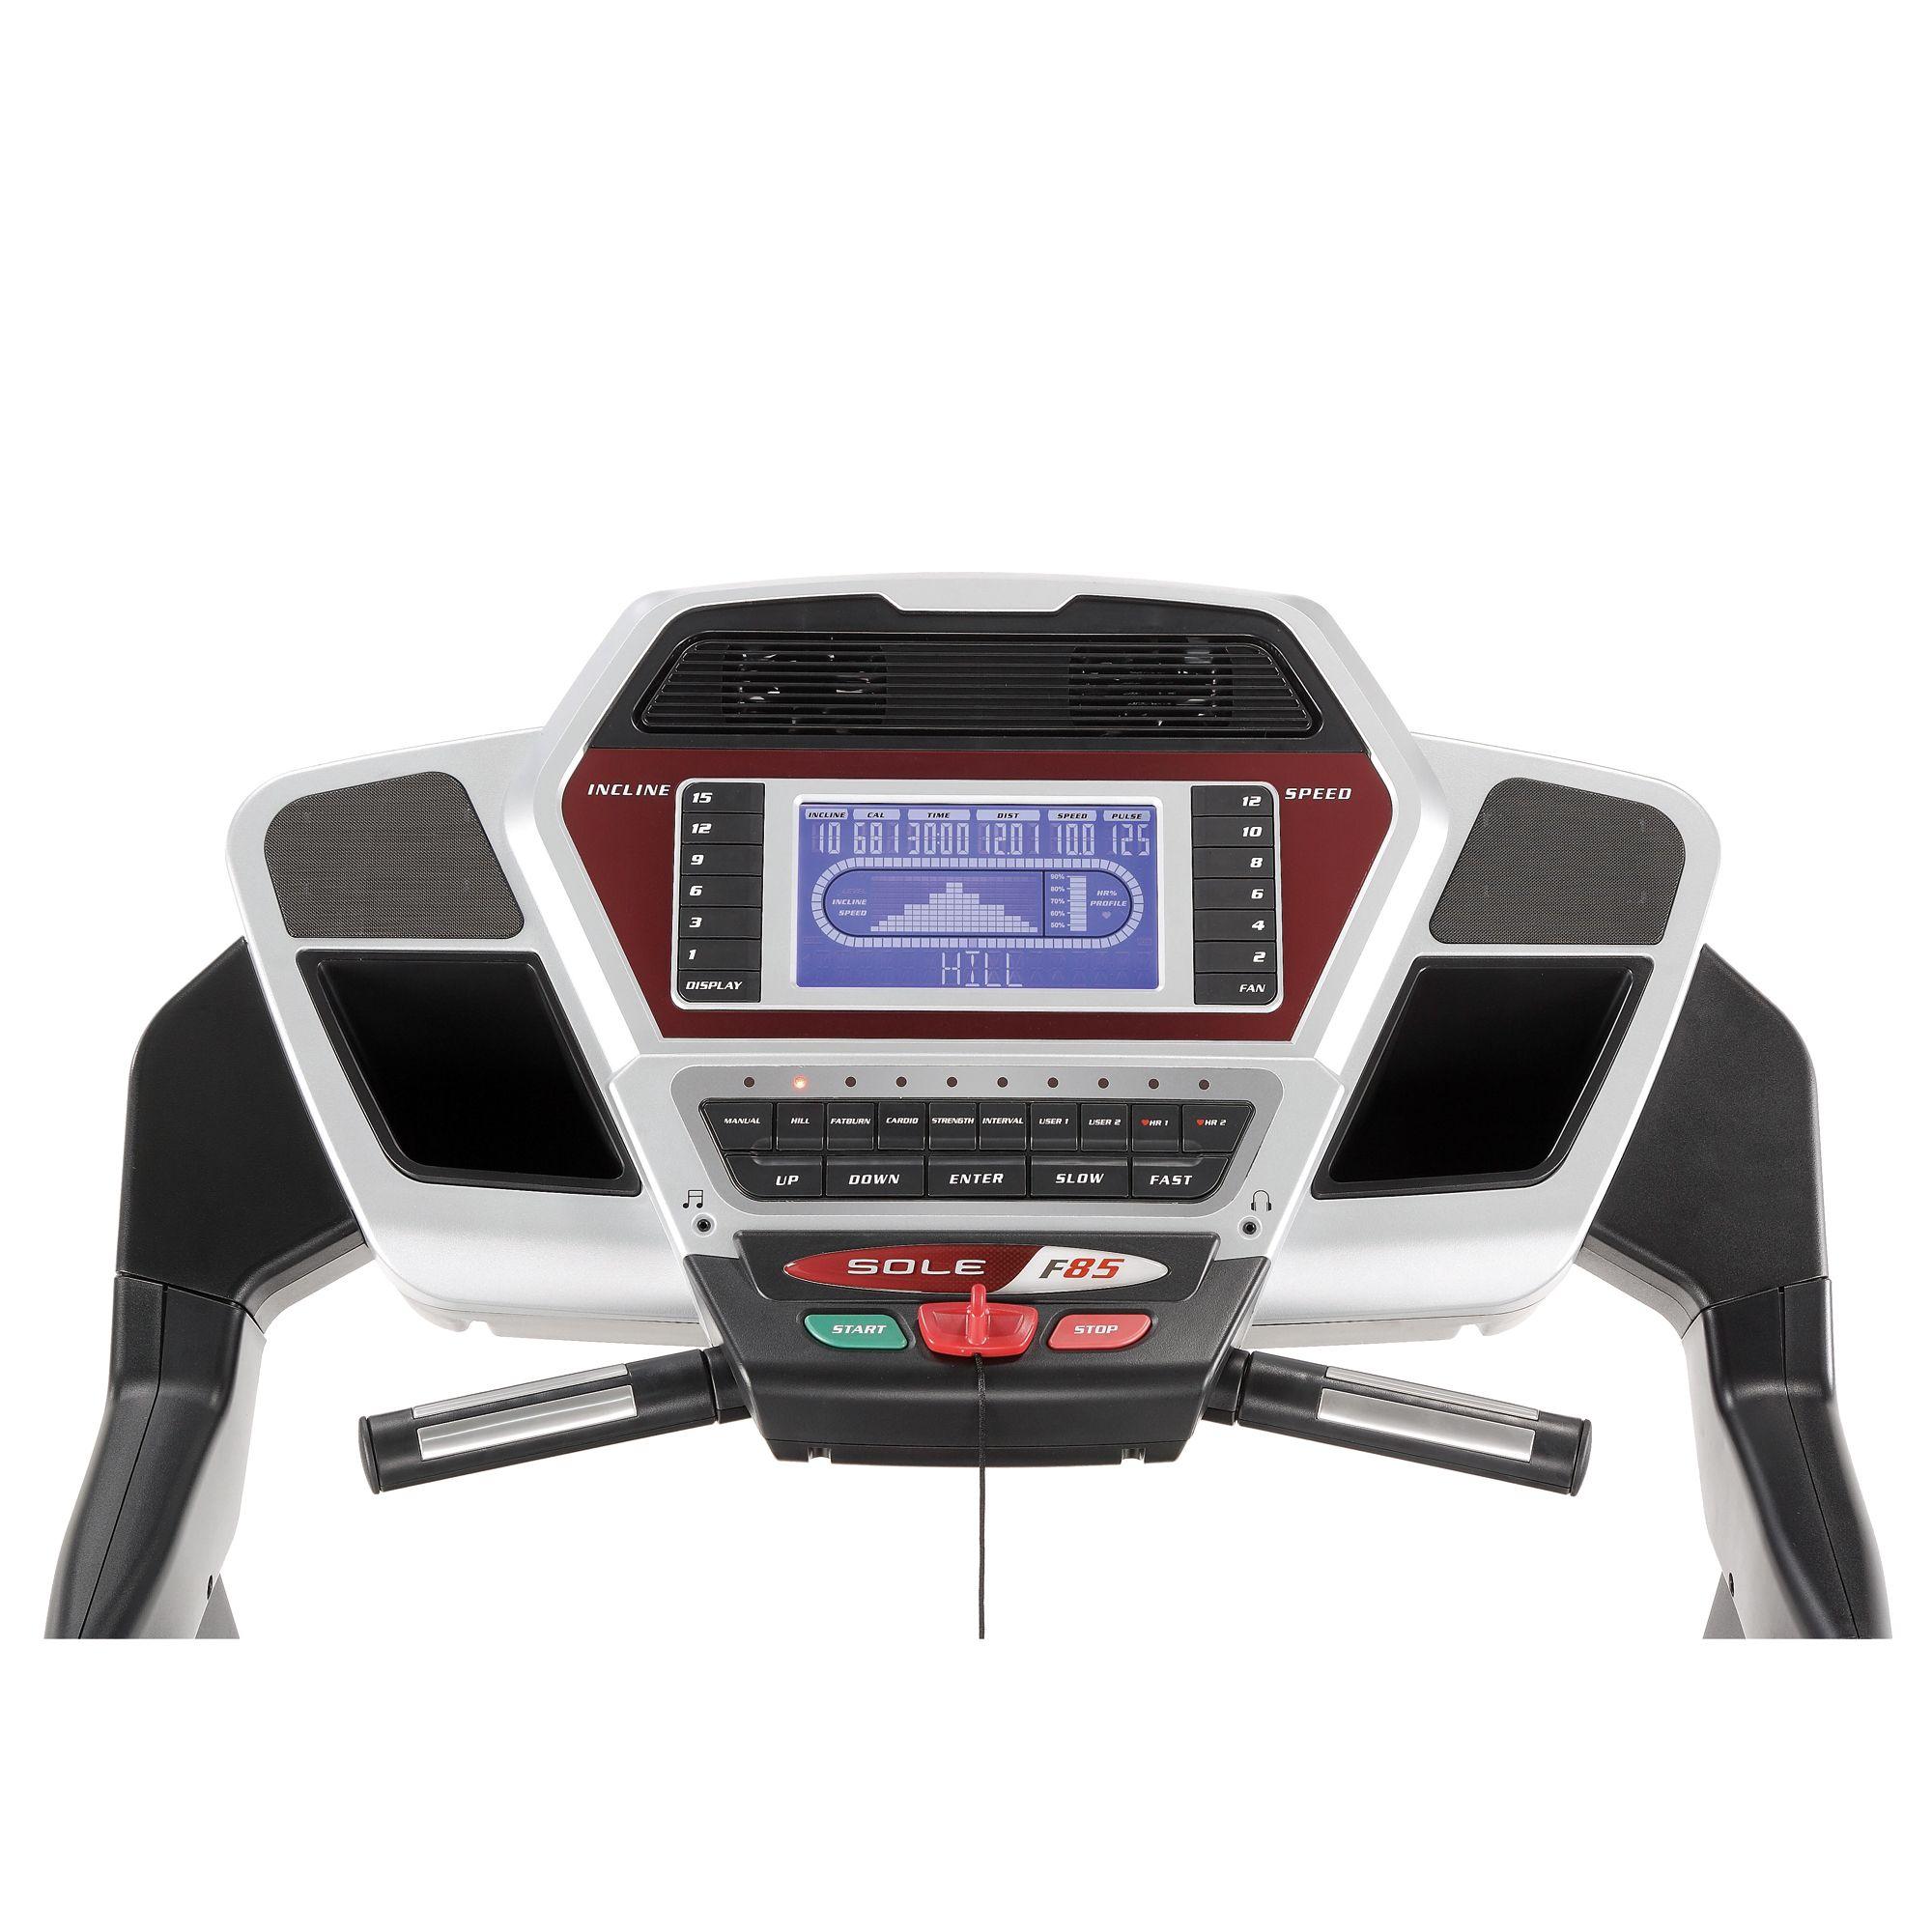 Sole F85 Folding Treadmill